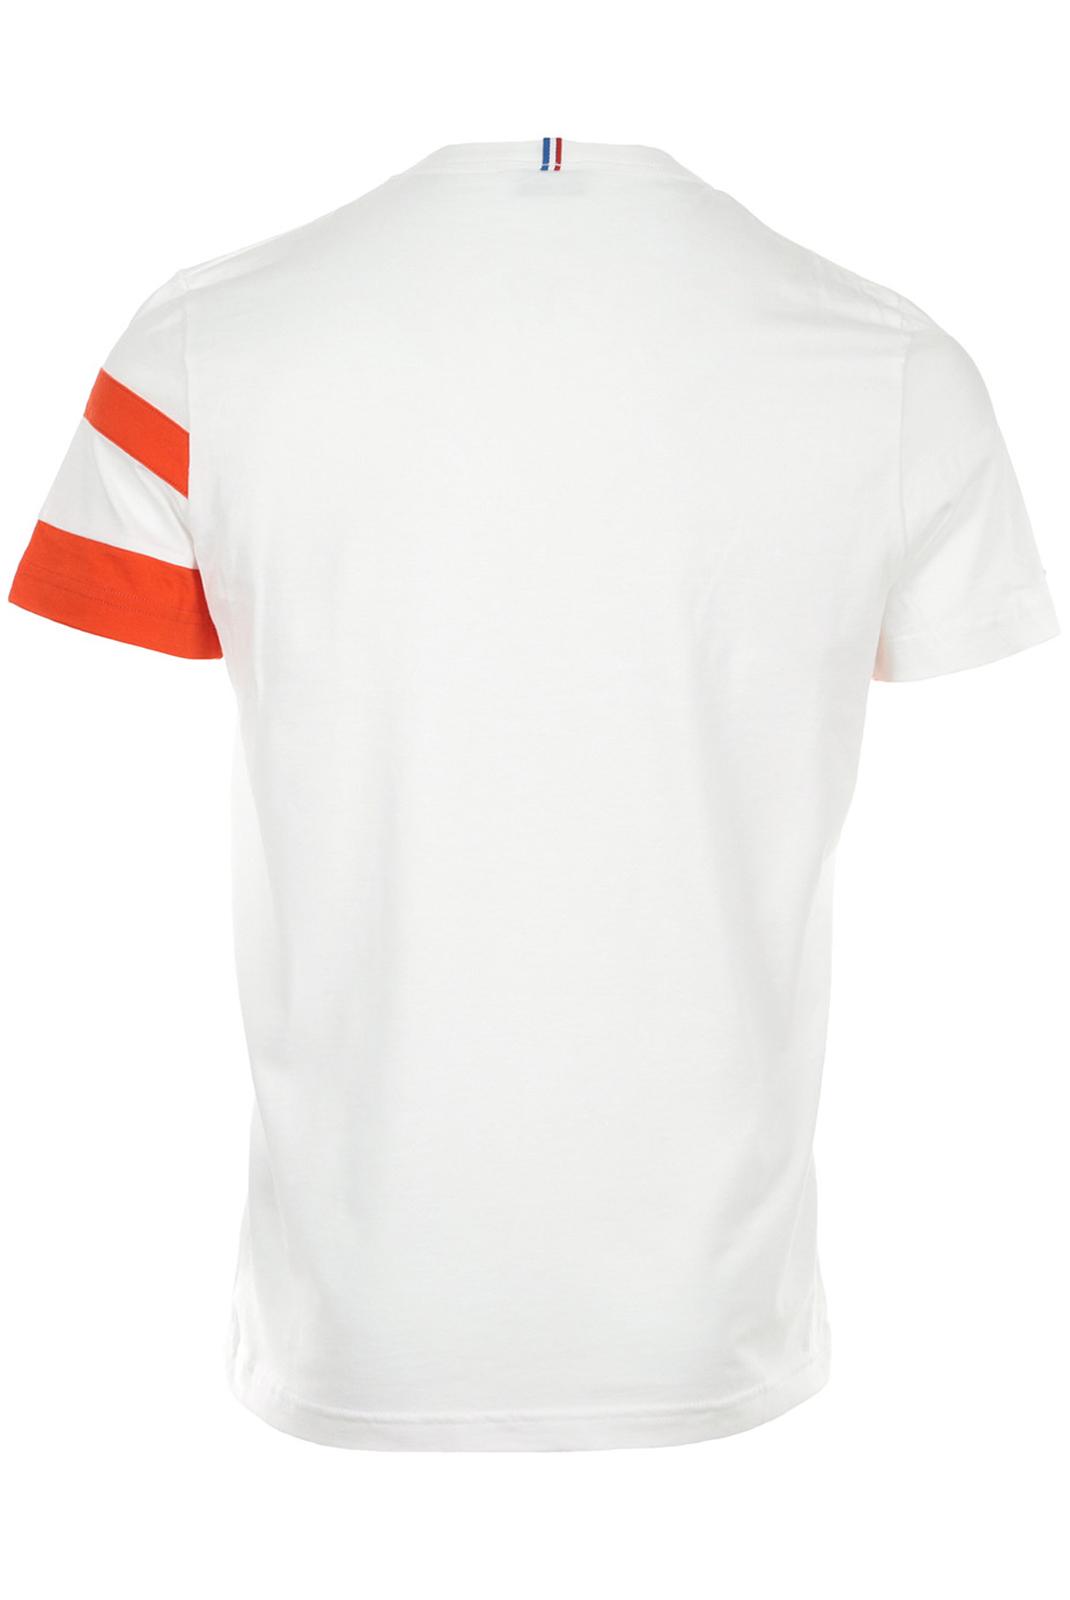 Tee-shirts  Le coq sportif 1911303 BLANC/ORANGE